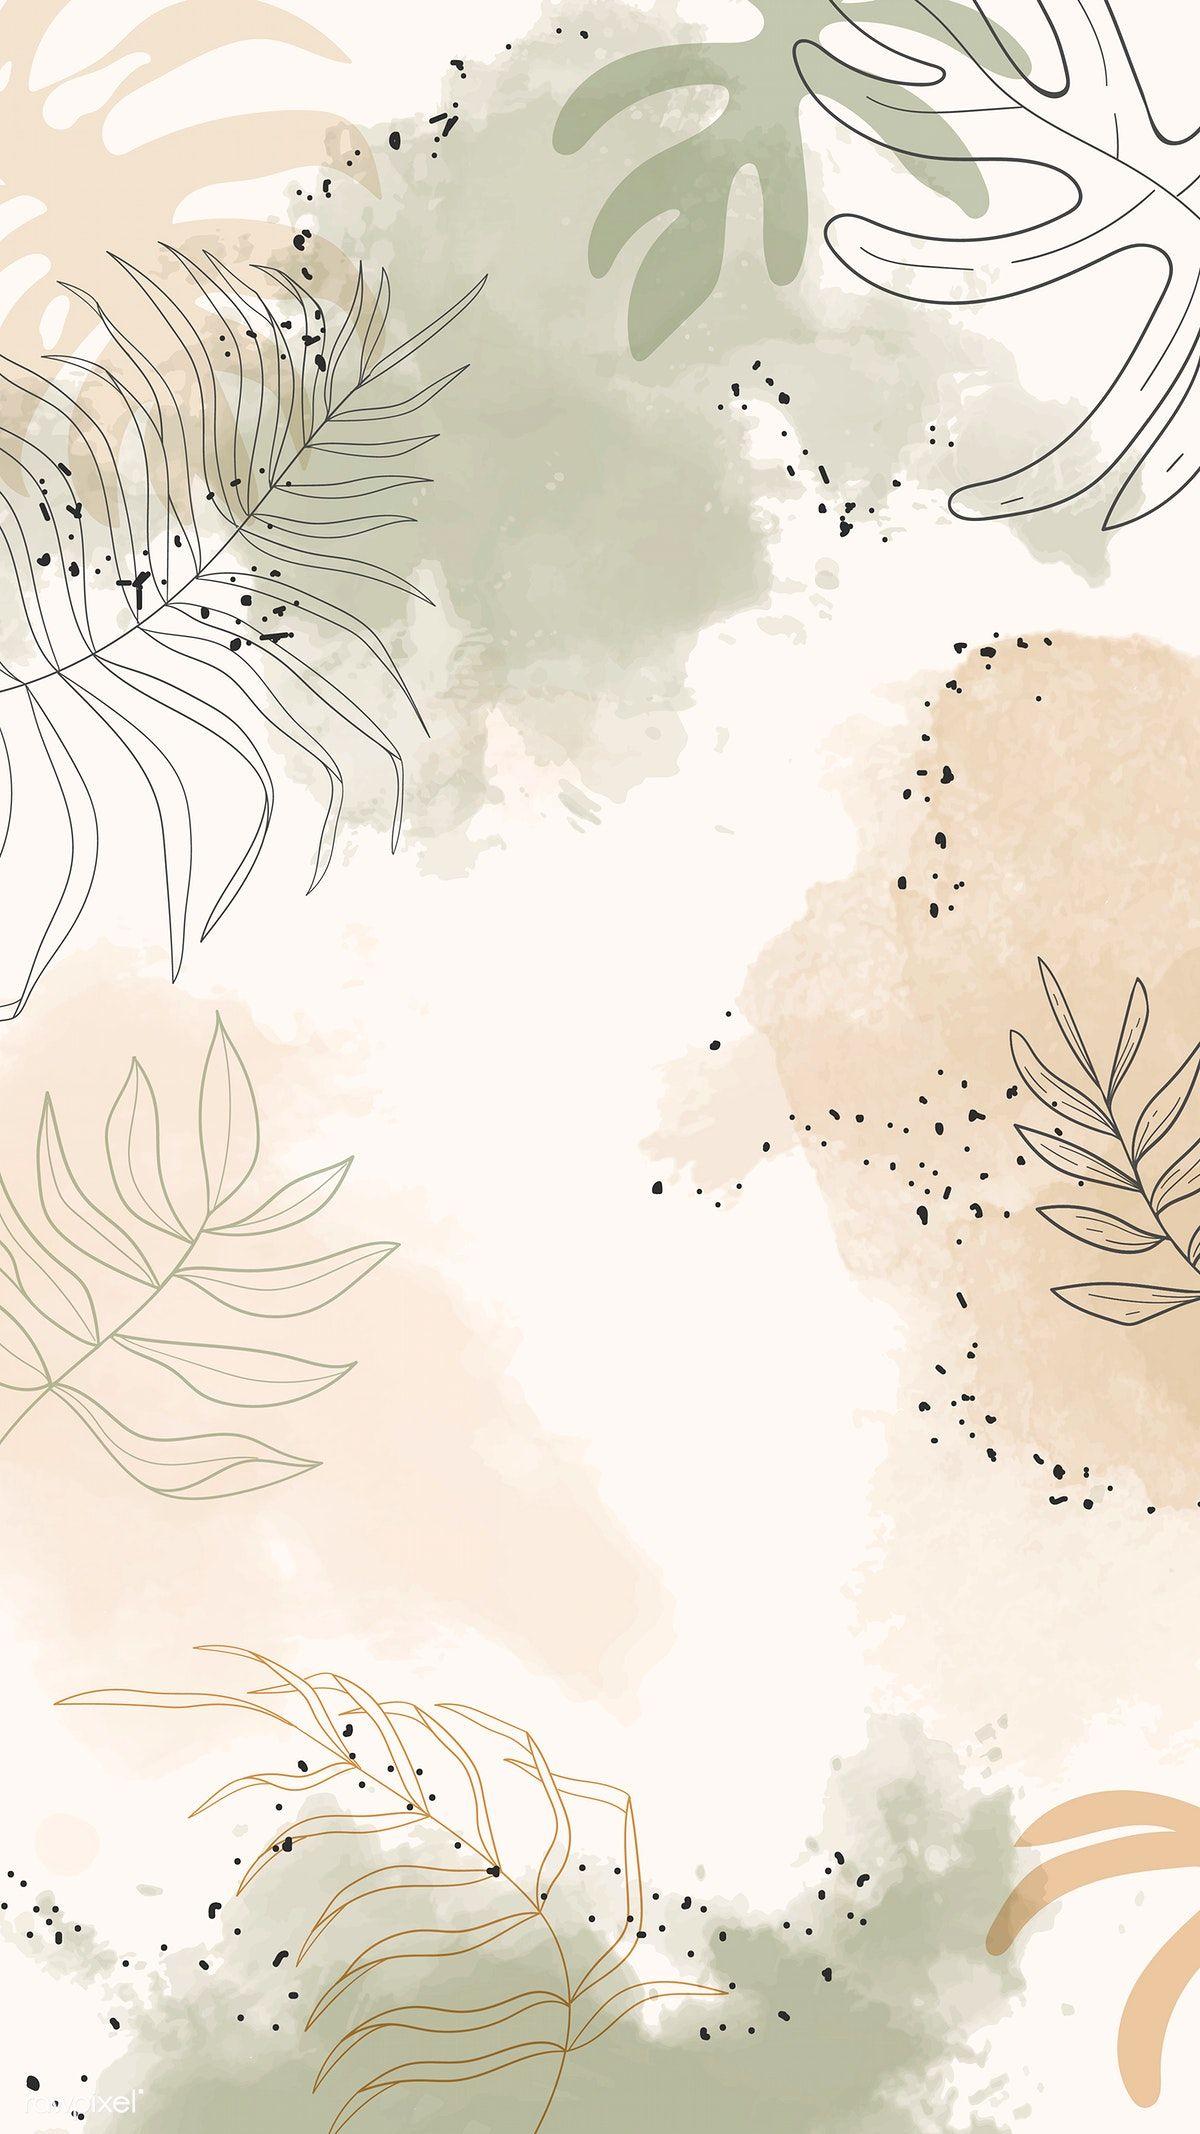 Download premium vector of Beige leafy watercolor mobile phone wallpaper -   13 plants Wallpaper phone ideas